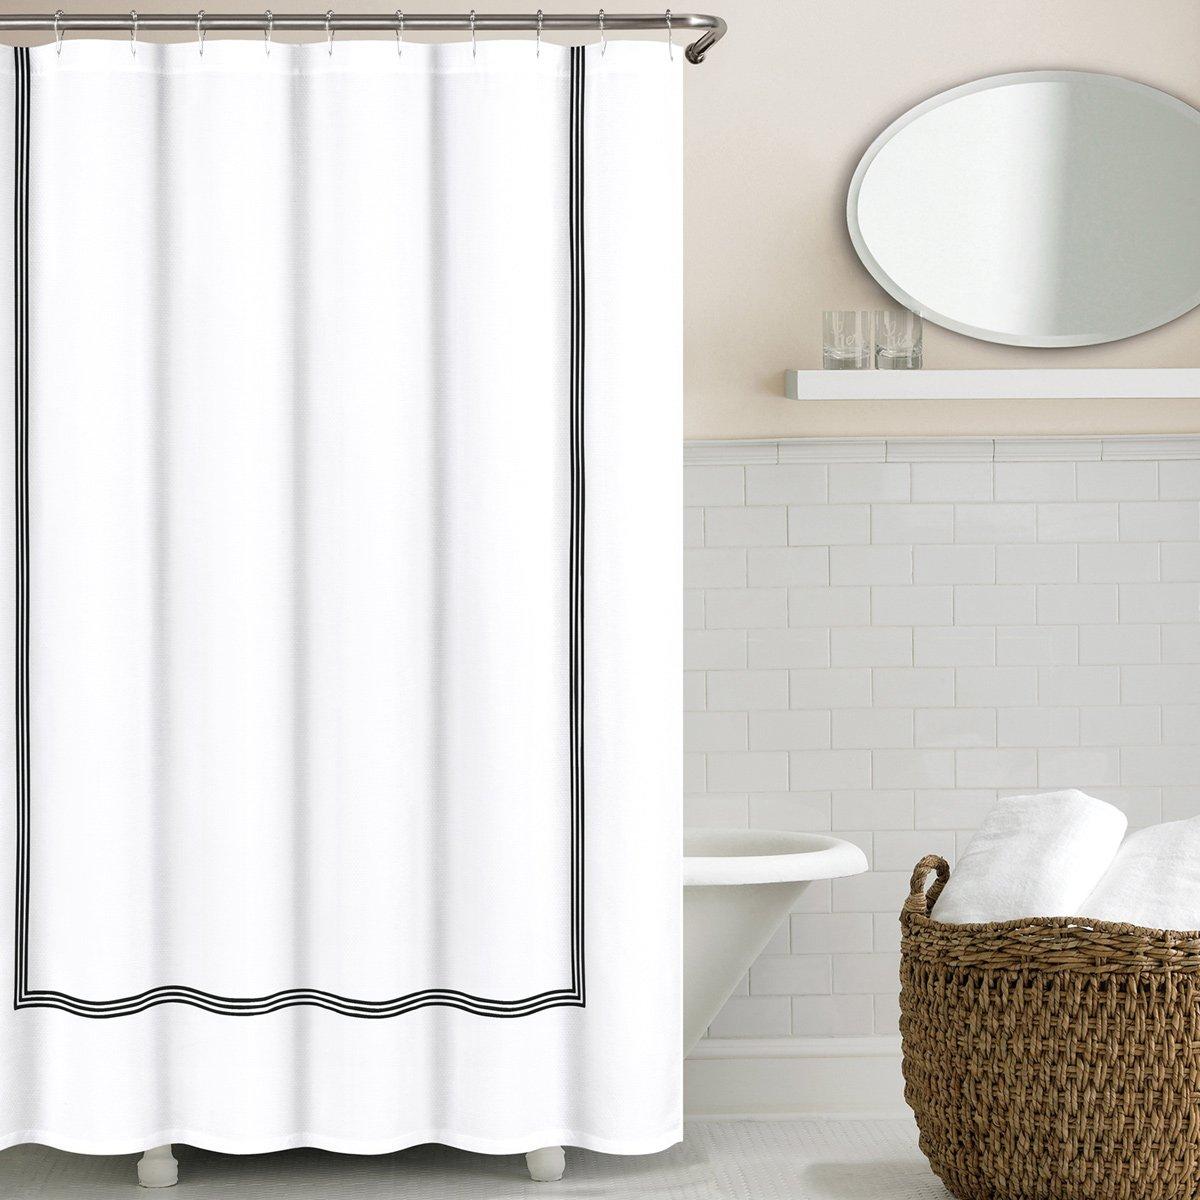 Echelon Home Collection Black Echelon Hotel Three Line Shower Curtain,